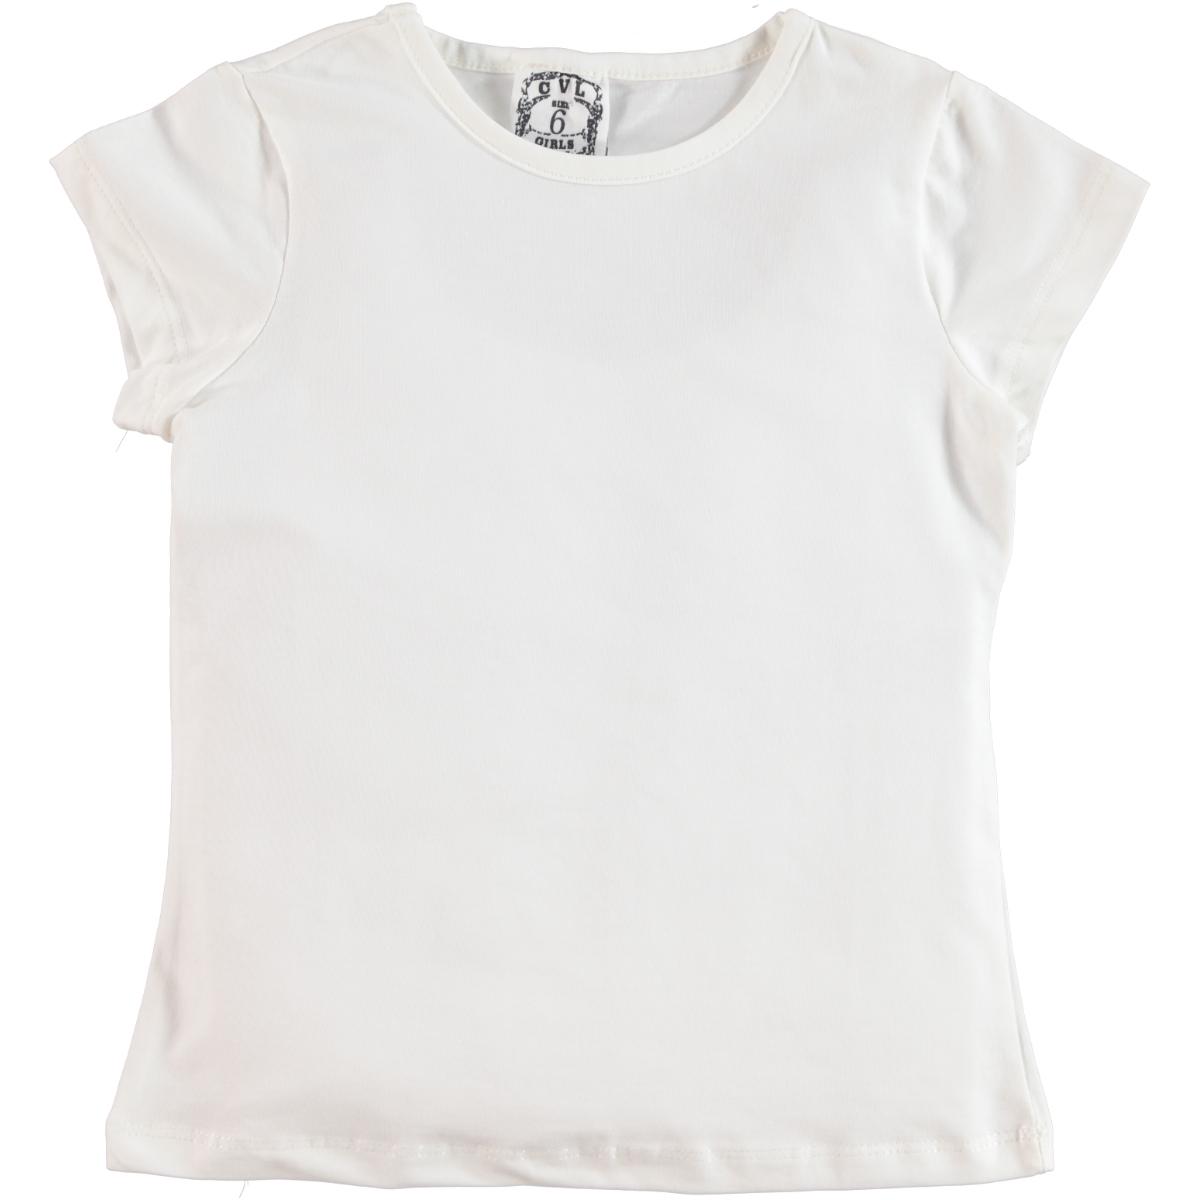 Cvl Girl Kids T-Shirt Ecru Age 10-13